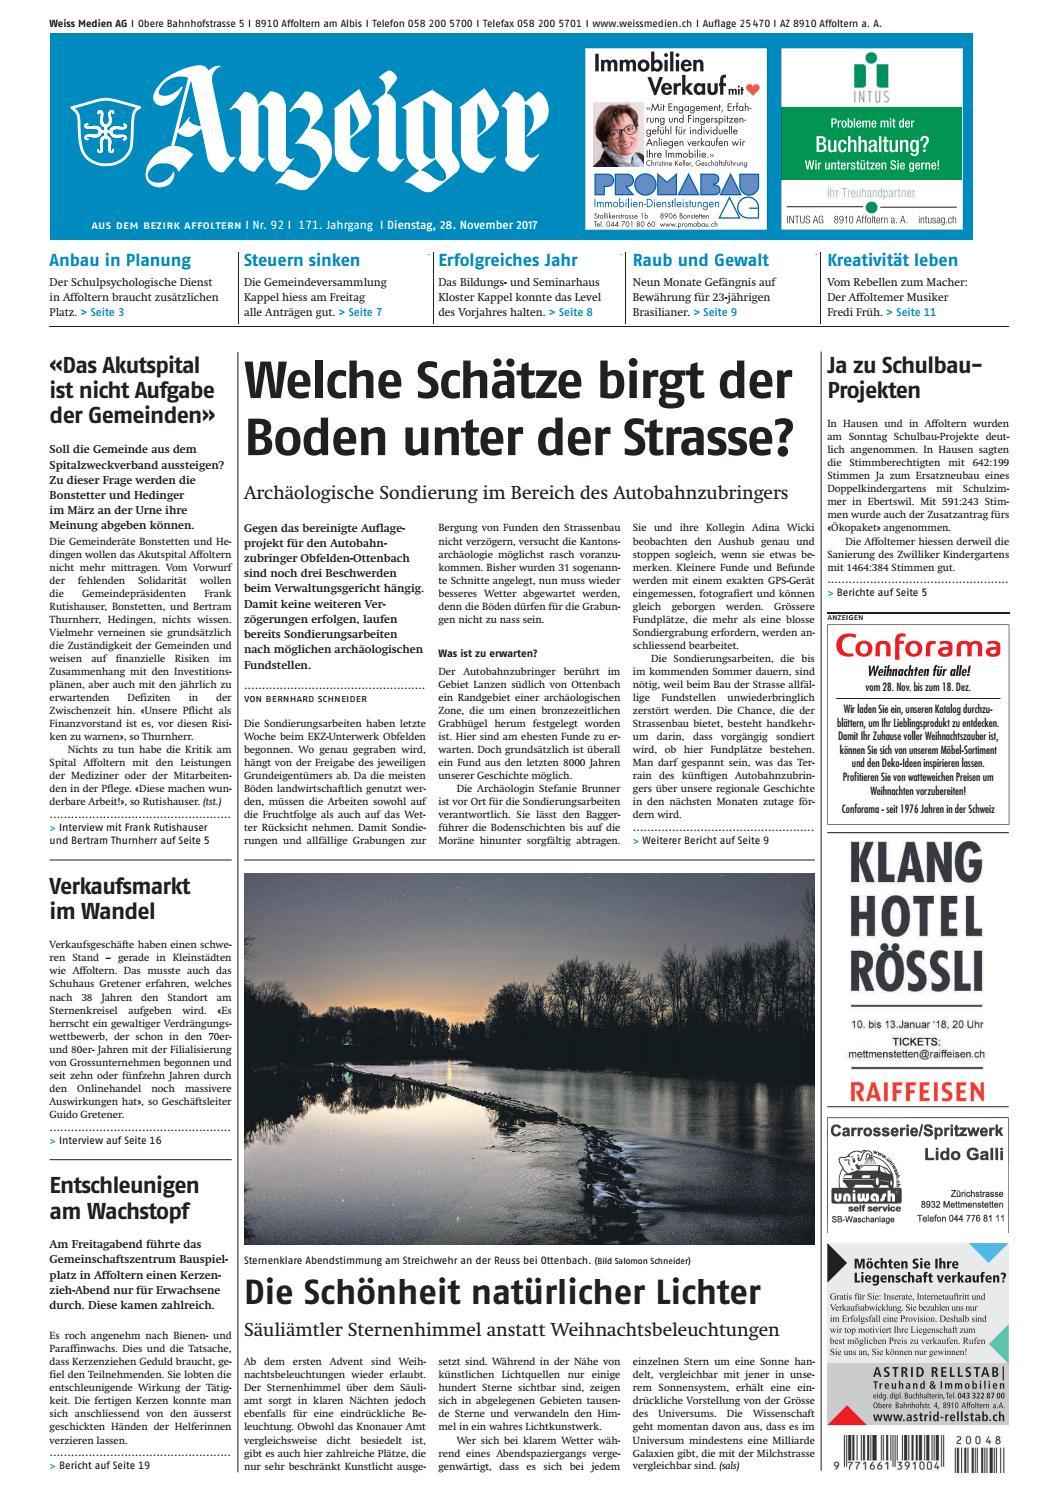 092 2017 by AZ-Anzeiger - issuu